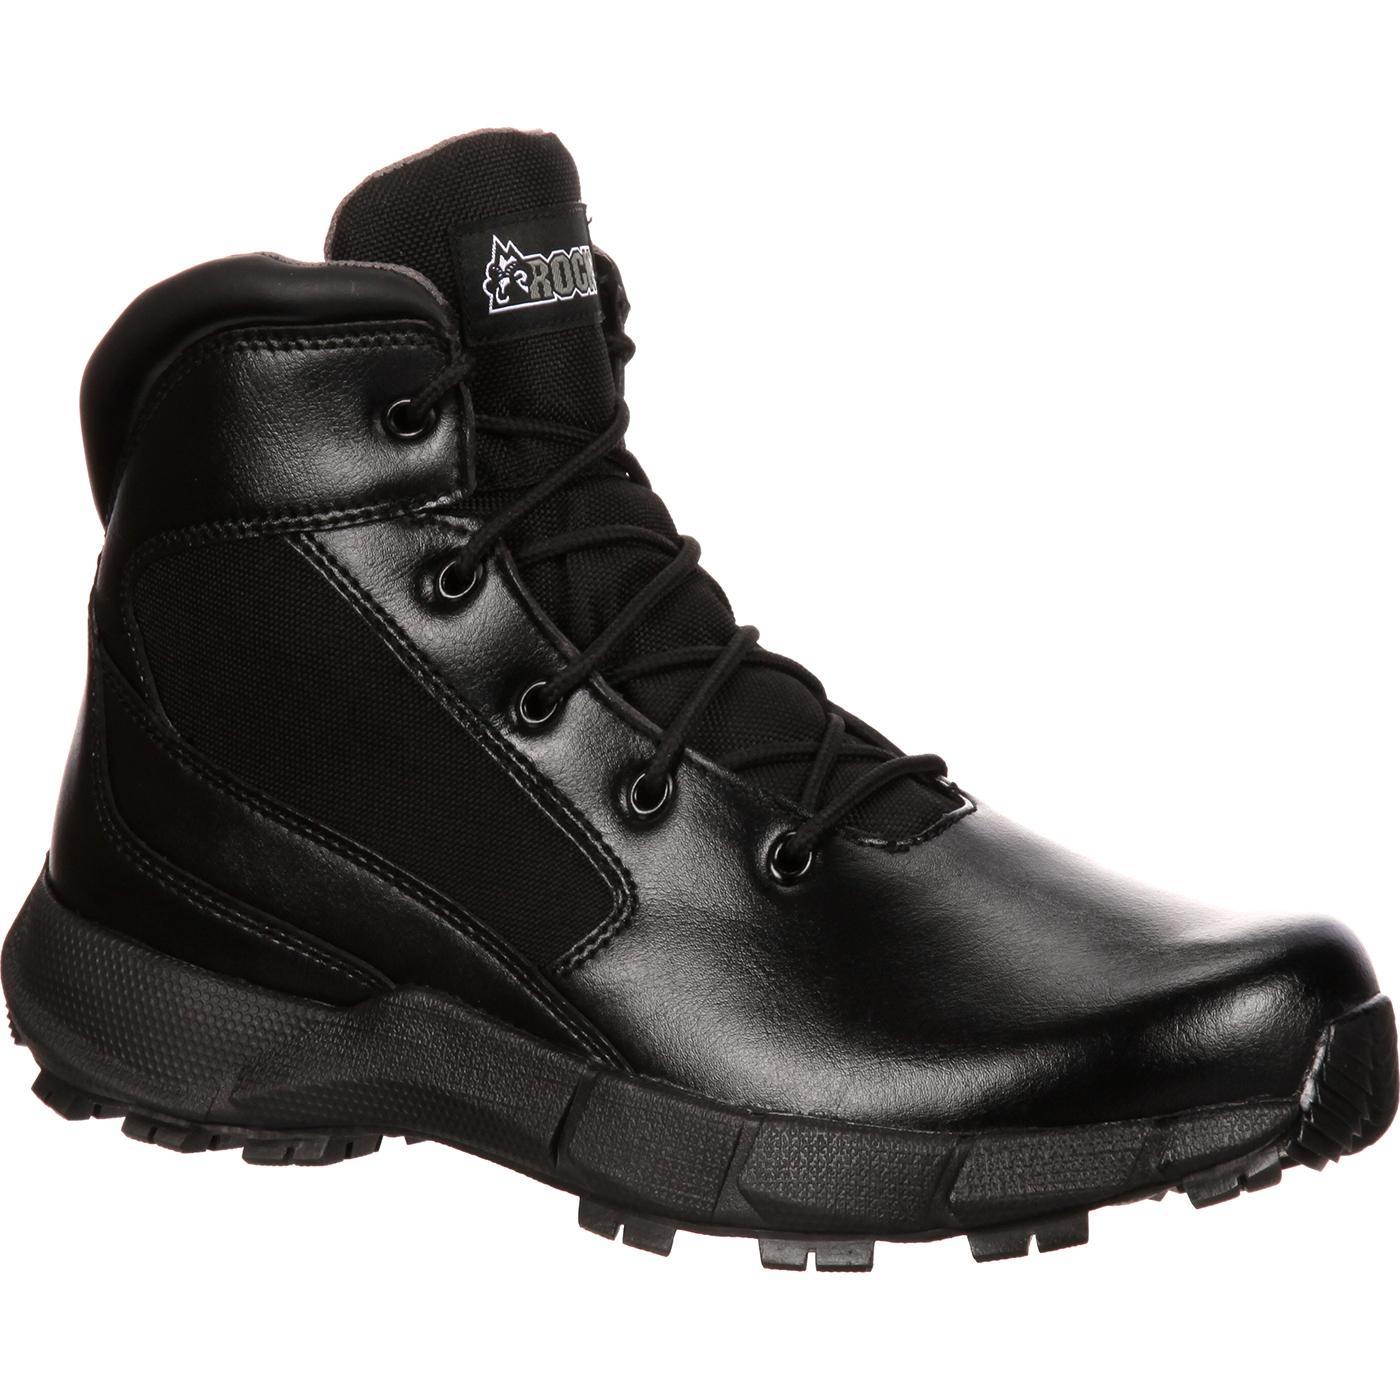 Rocky Broadhead Men S Polishable Black Duty Boot Rkyd013